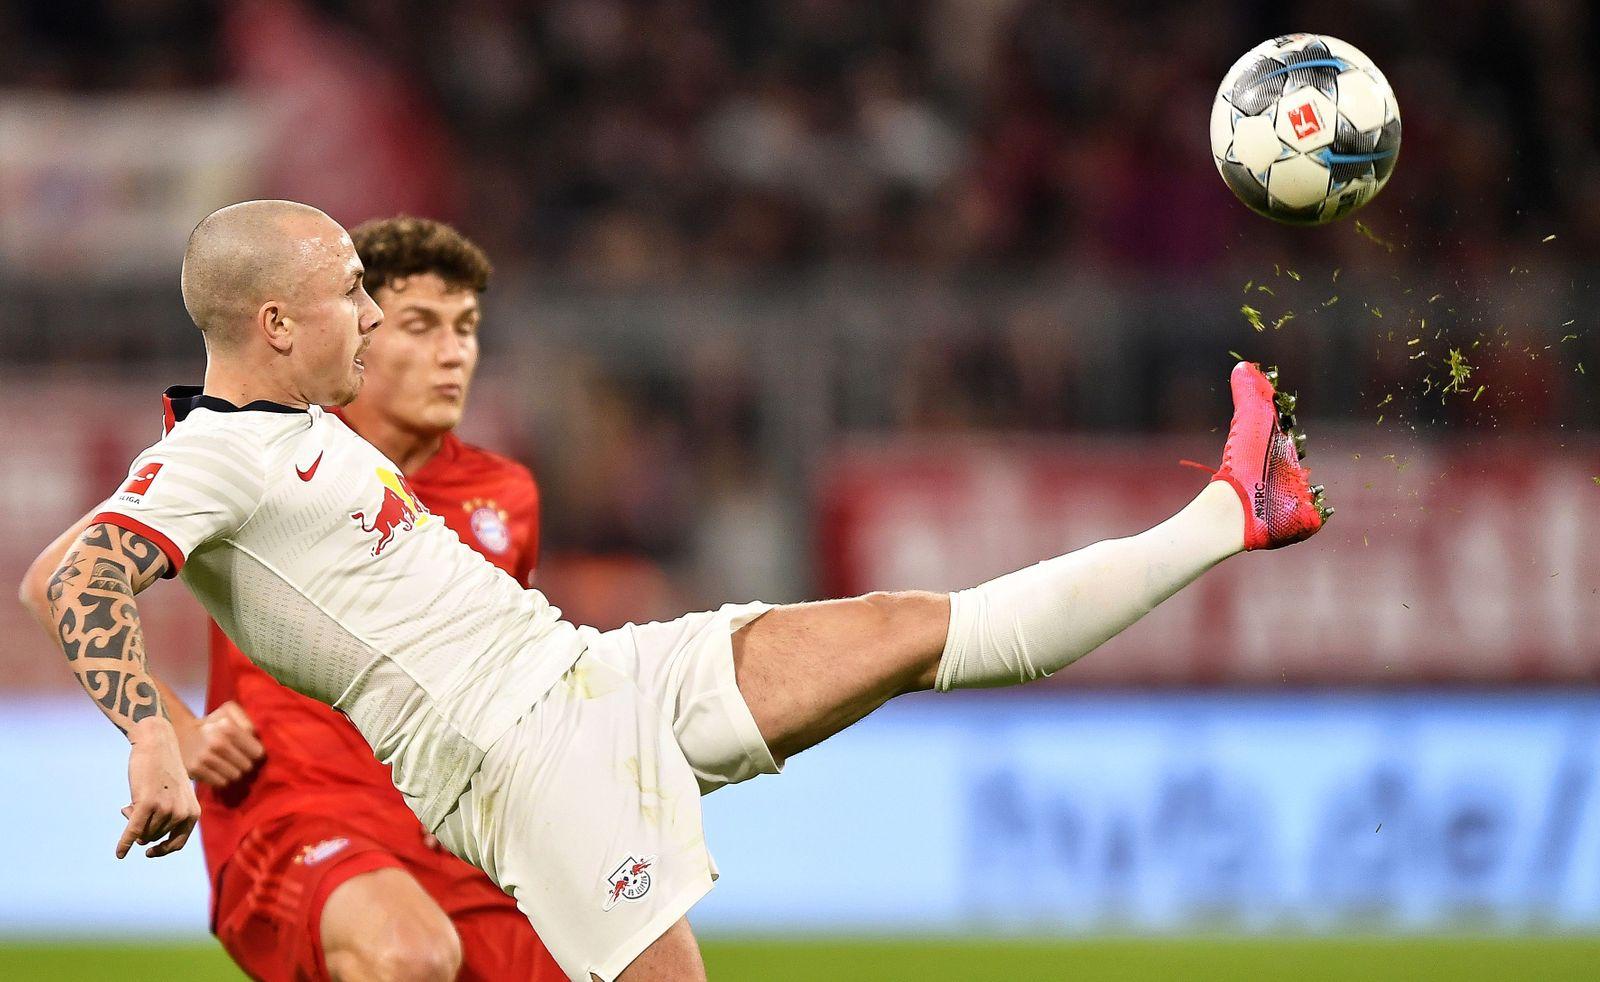 Bayern Munich vs RB Leipzig, Germany - 09 Feb 2020